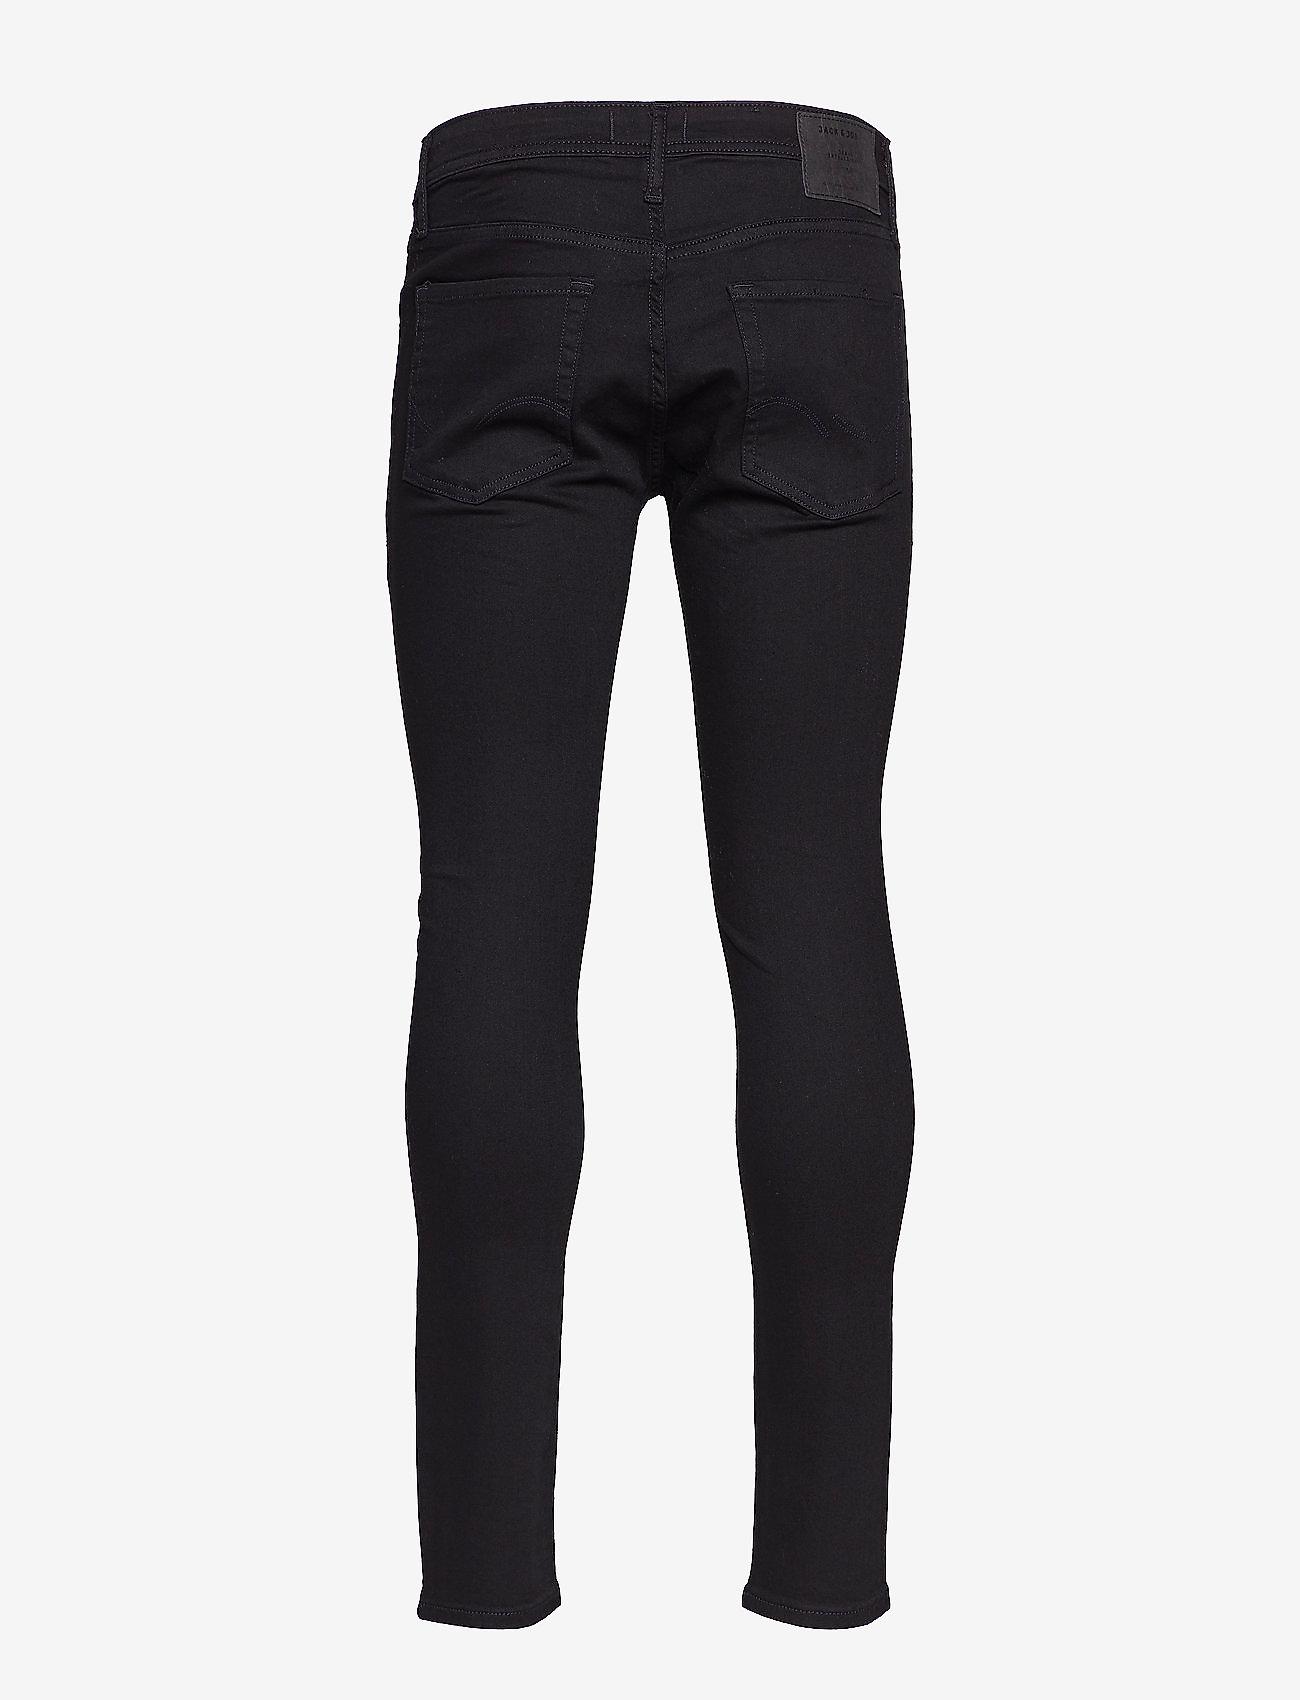 Jack & Jones - JJILIAM JJORIGINAL AM 009 50 SPS - skinny jeans - black denim - 1